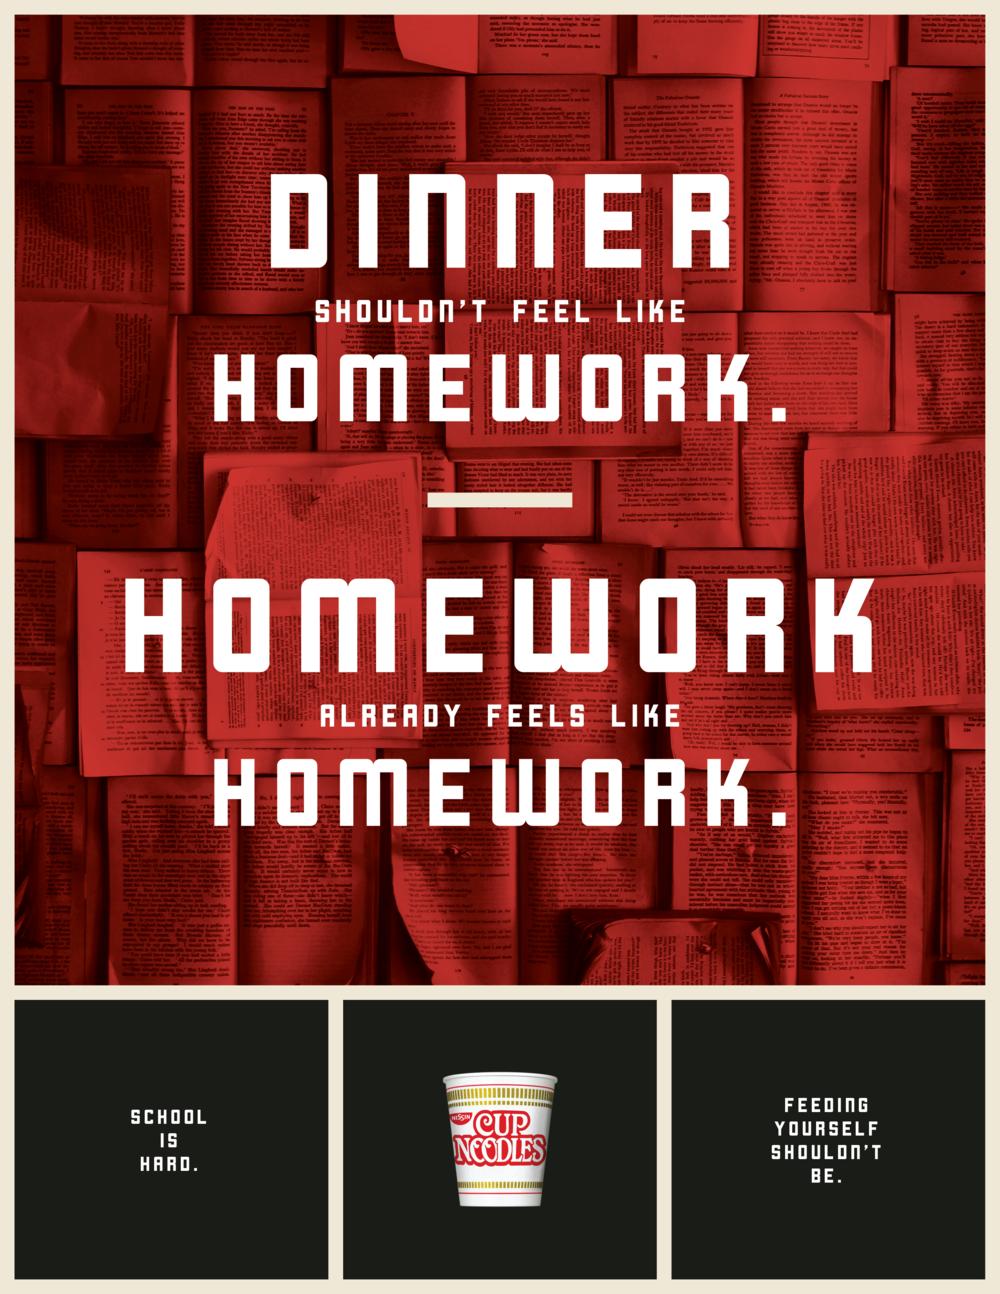 cup-noodles-dinner.png